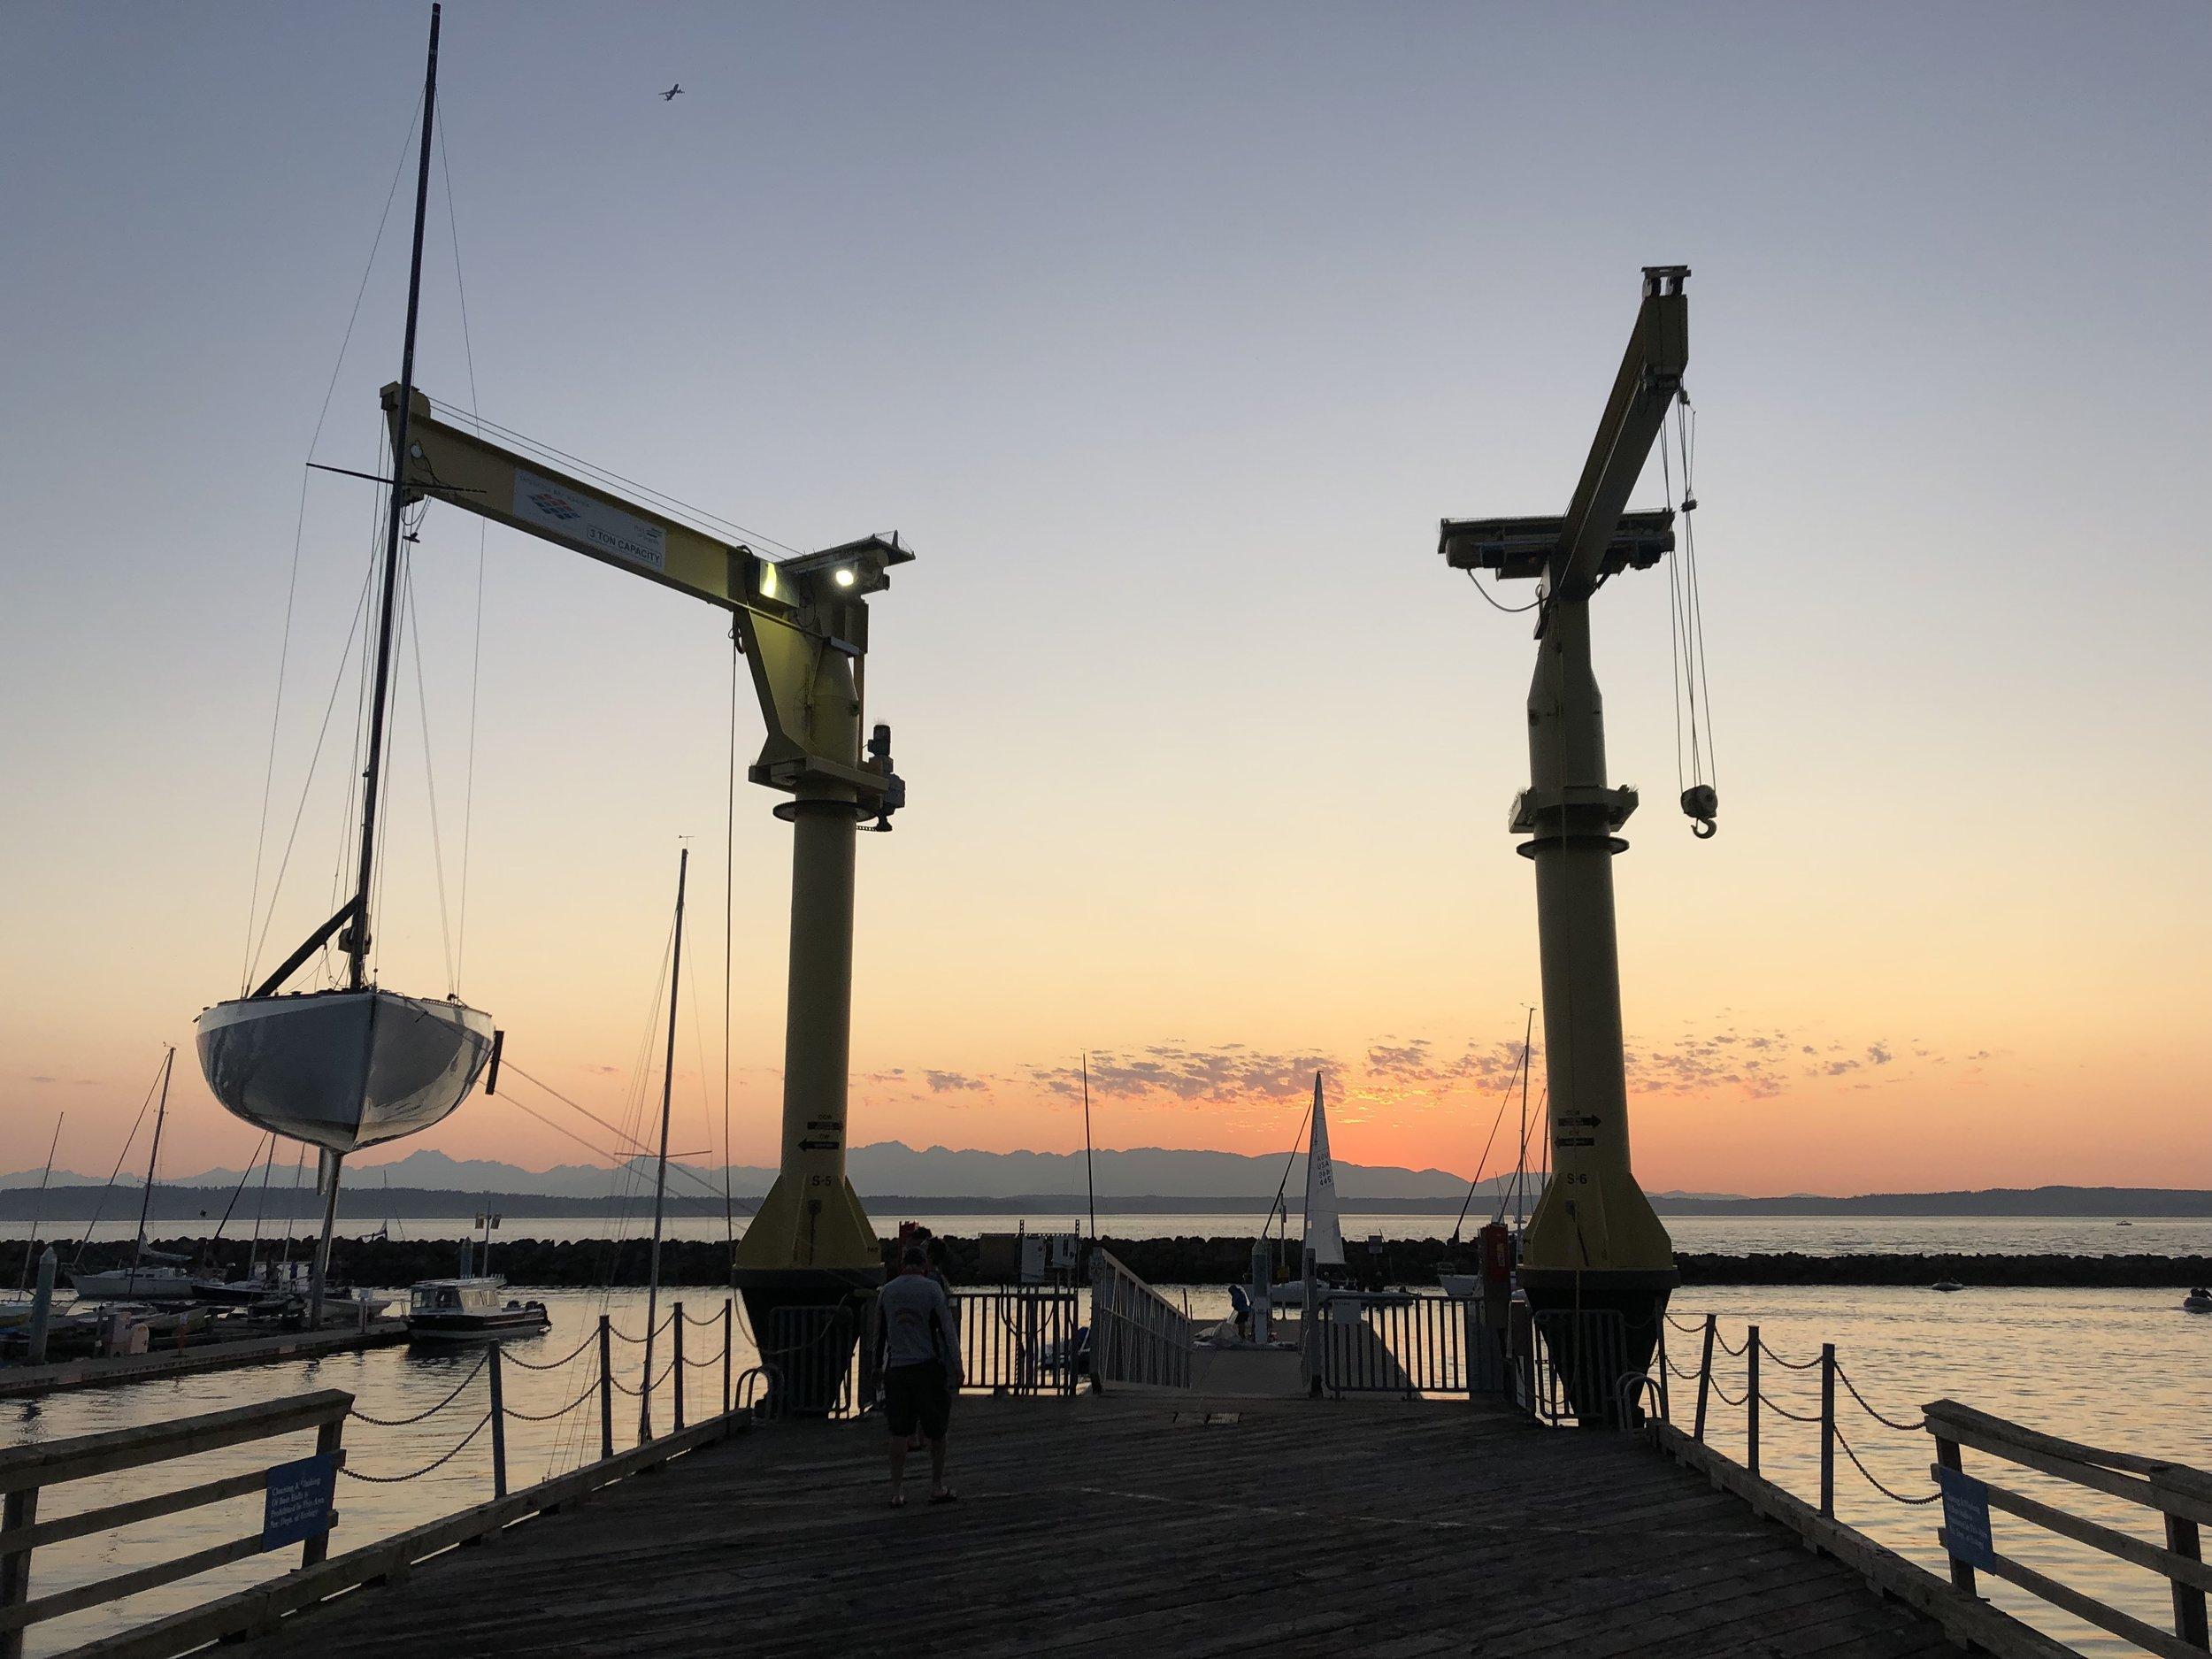 Warm summer evening sailing among the Olympics